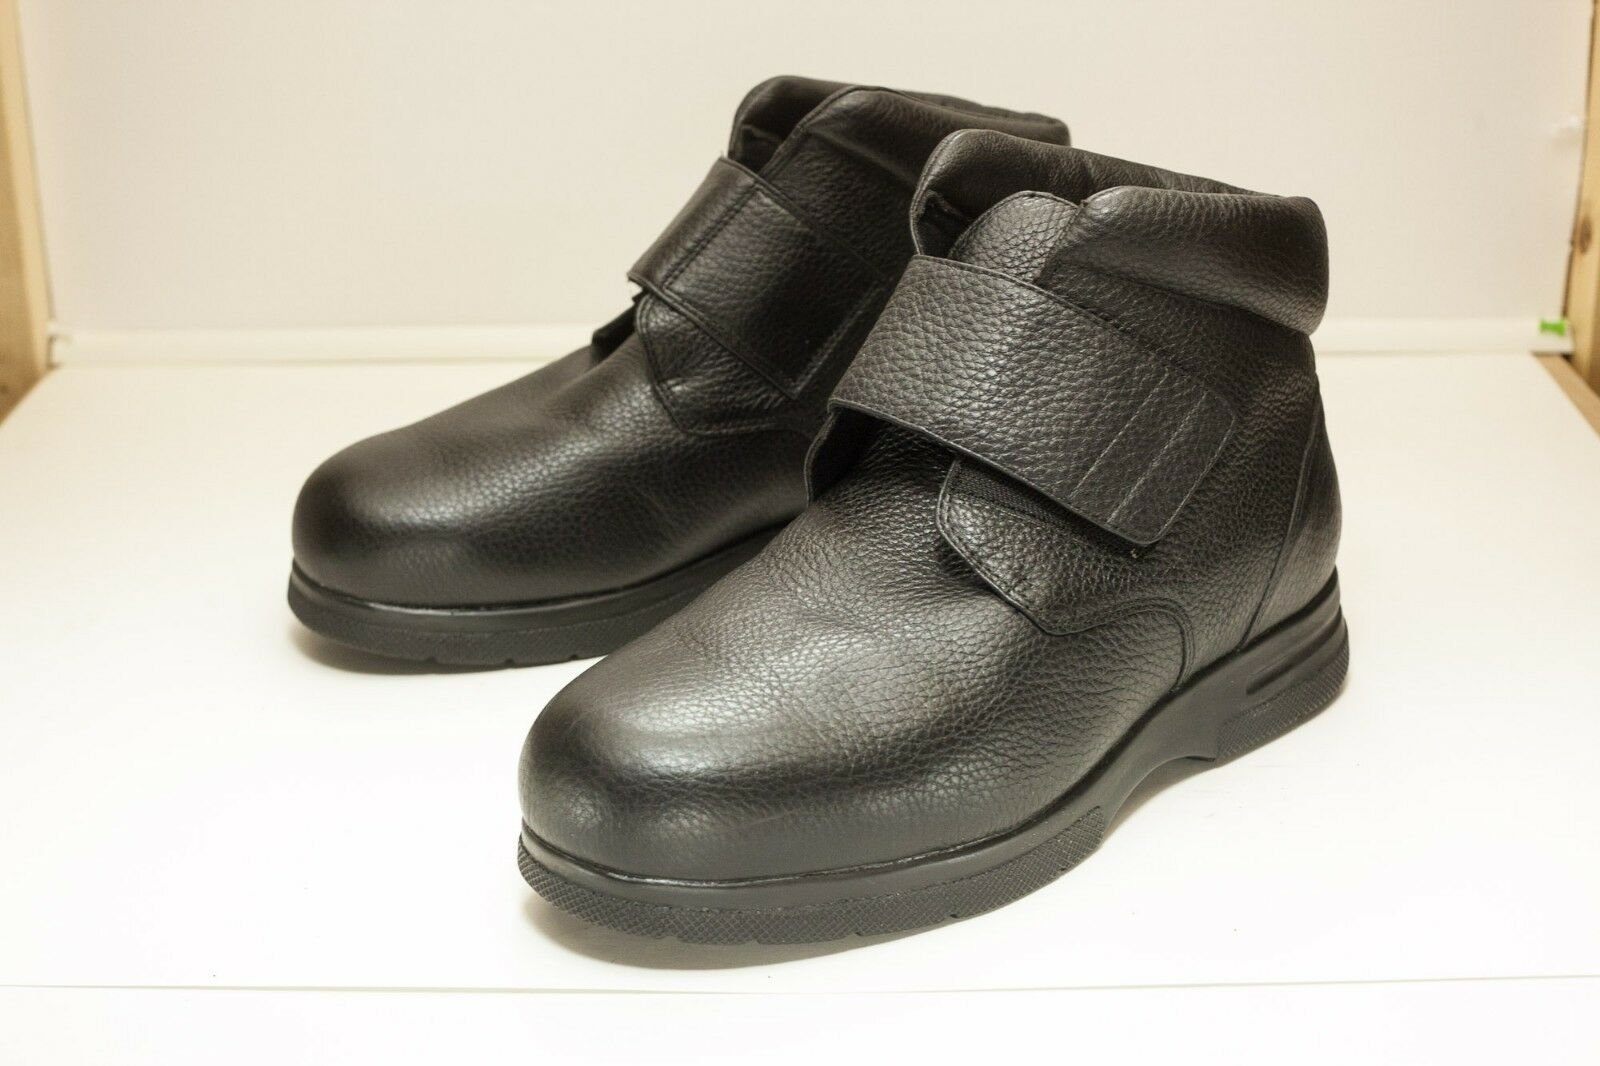 Drew Big Easy US 11.5 6E Ancho Negro botas al tobillo para Hombre